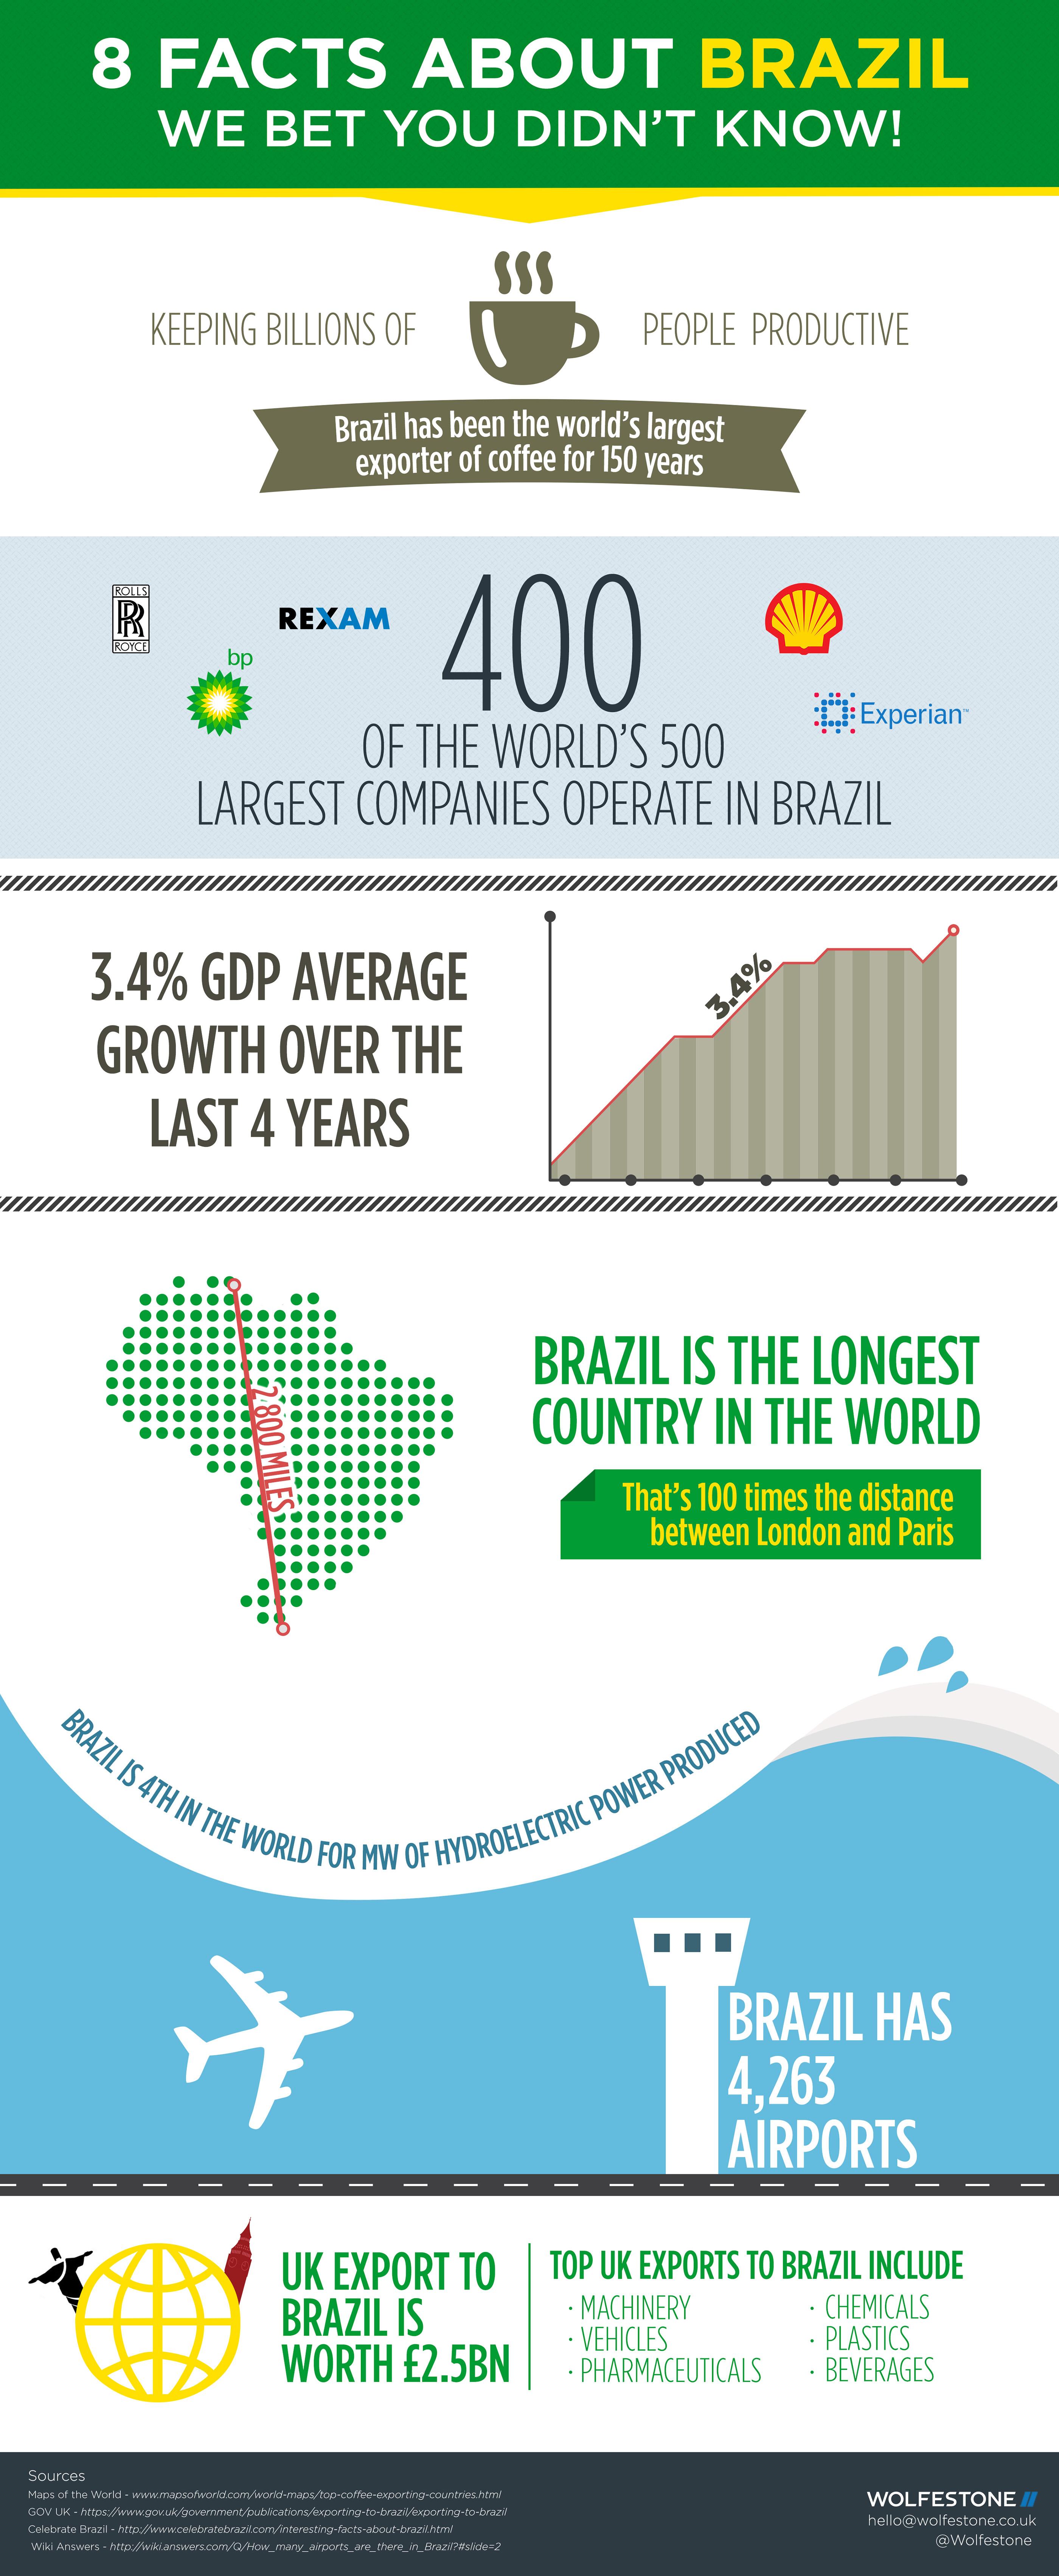 brazil-infographic-final-fortwitter